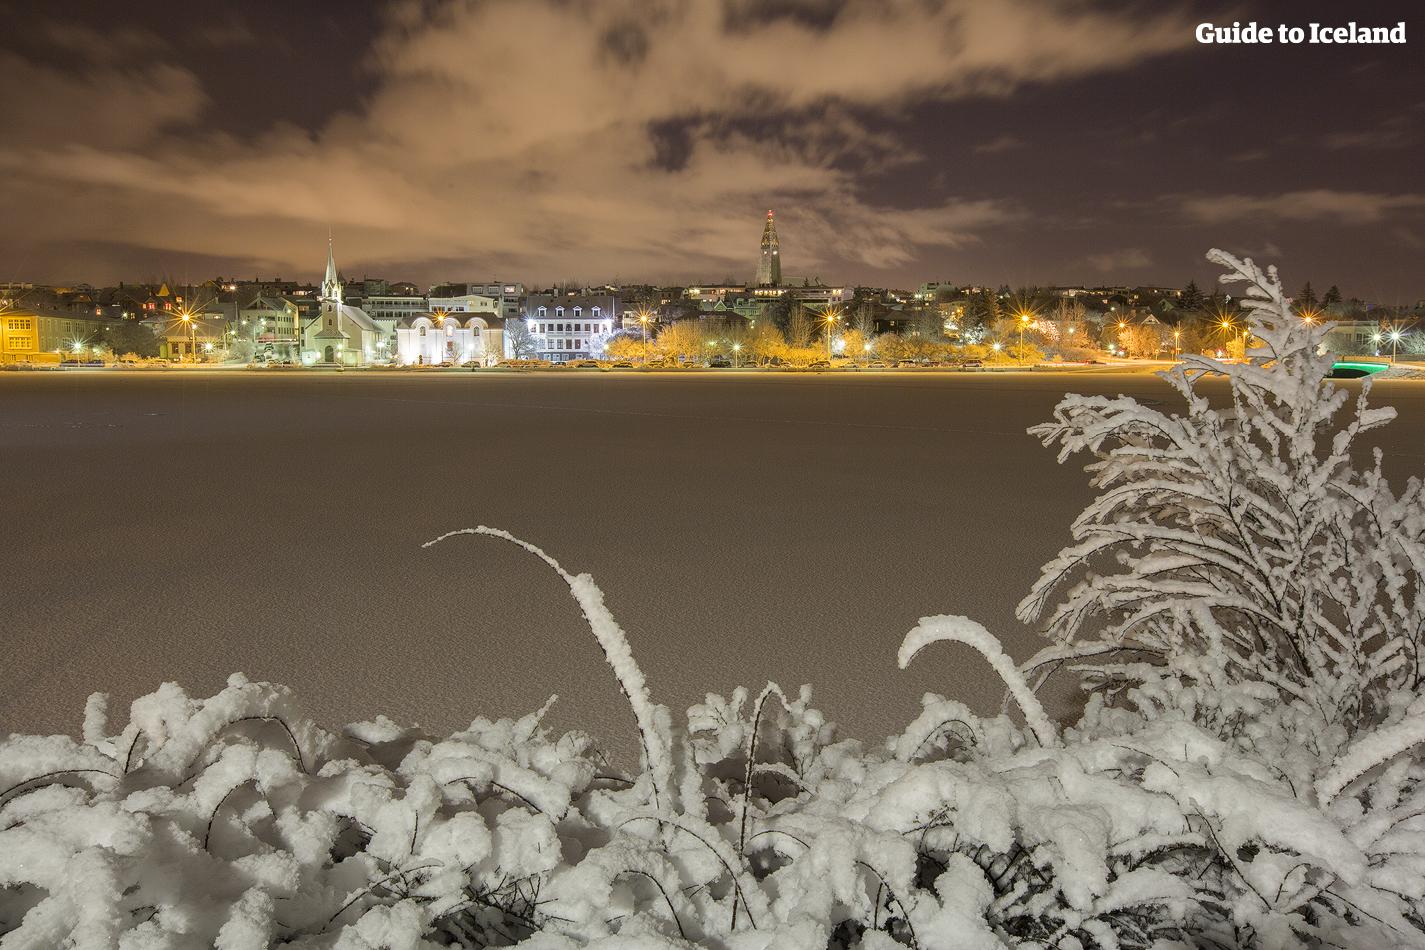 De skyline van Reykjavík fonkelt en brengt licht in de lange, donkere winternachten van IJsland.